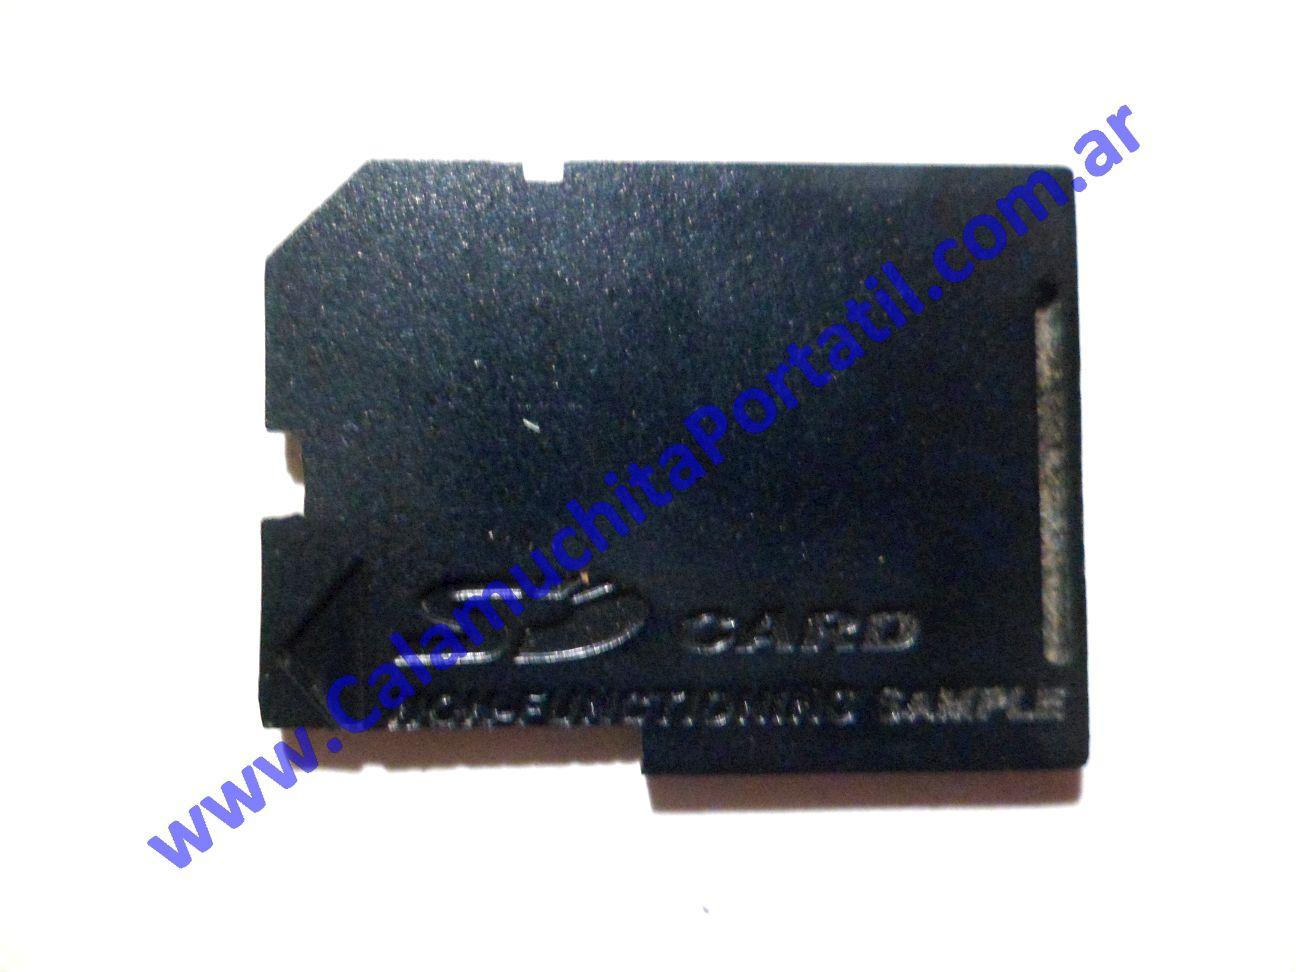 0070XPS Protector SD Fujitsu Siemens Amilo A1650G / MS2174